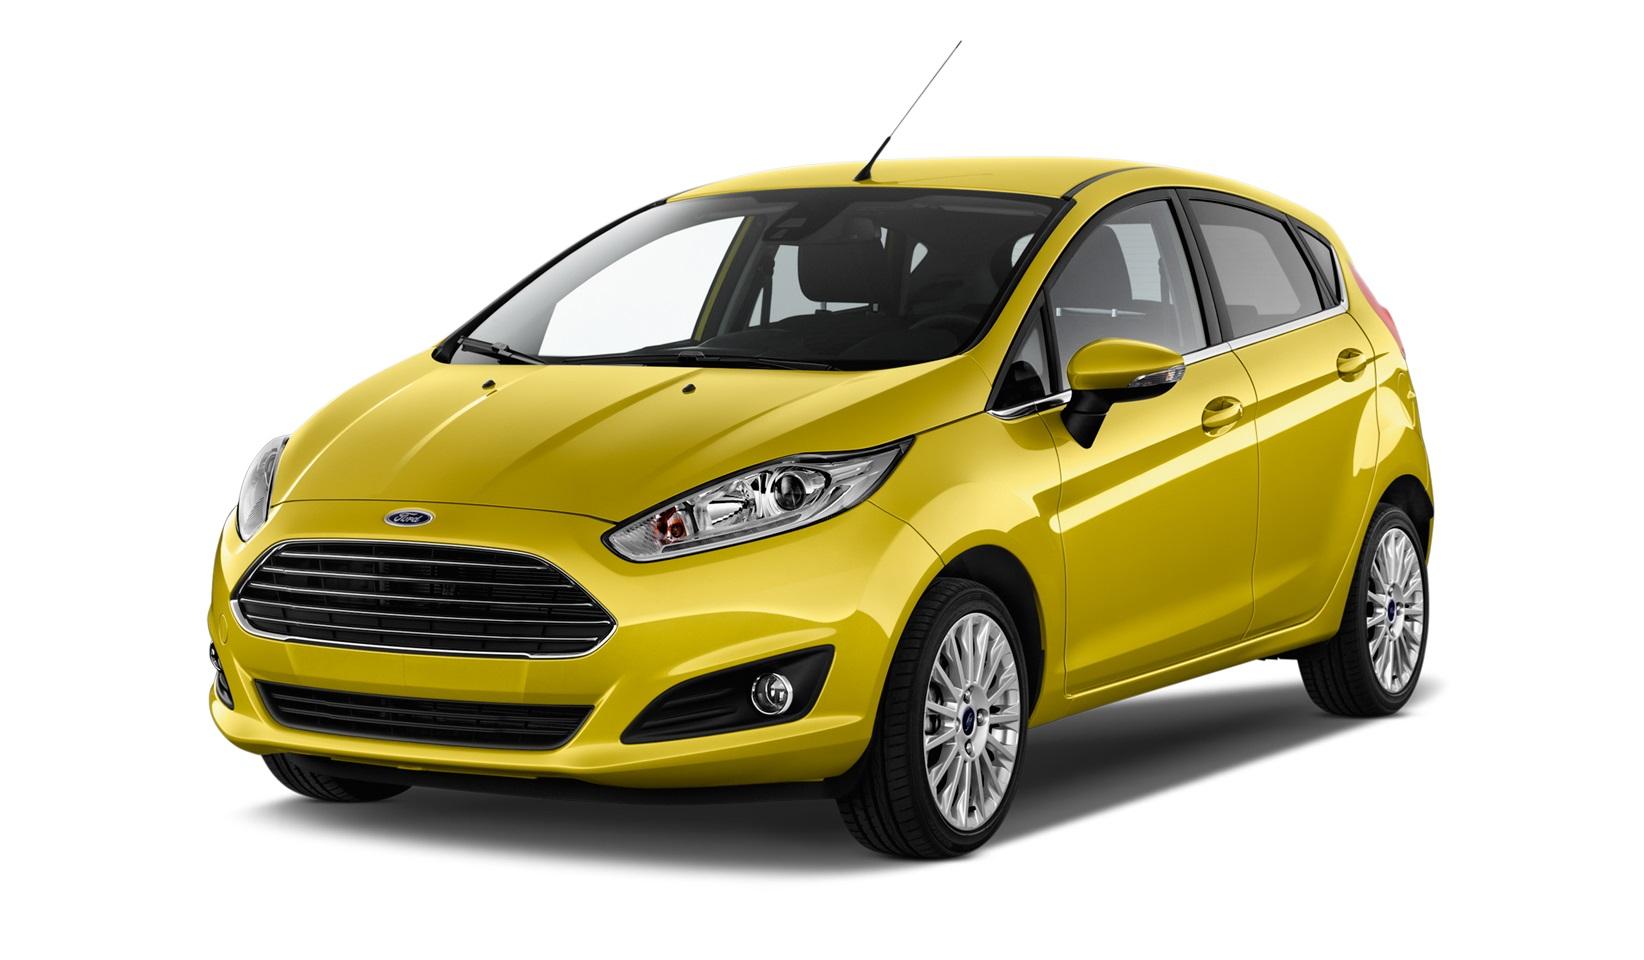 Ford Fiesta 2019 1.6L Titanium in Egypt: New Car Prices ...